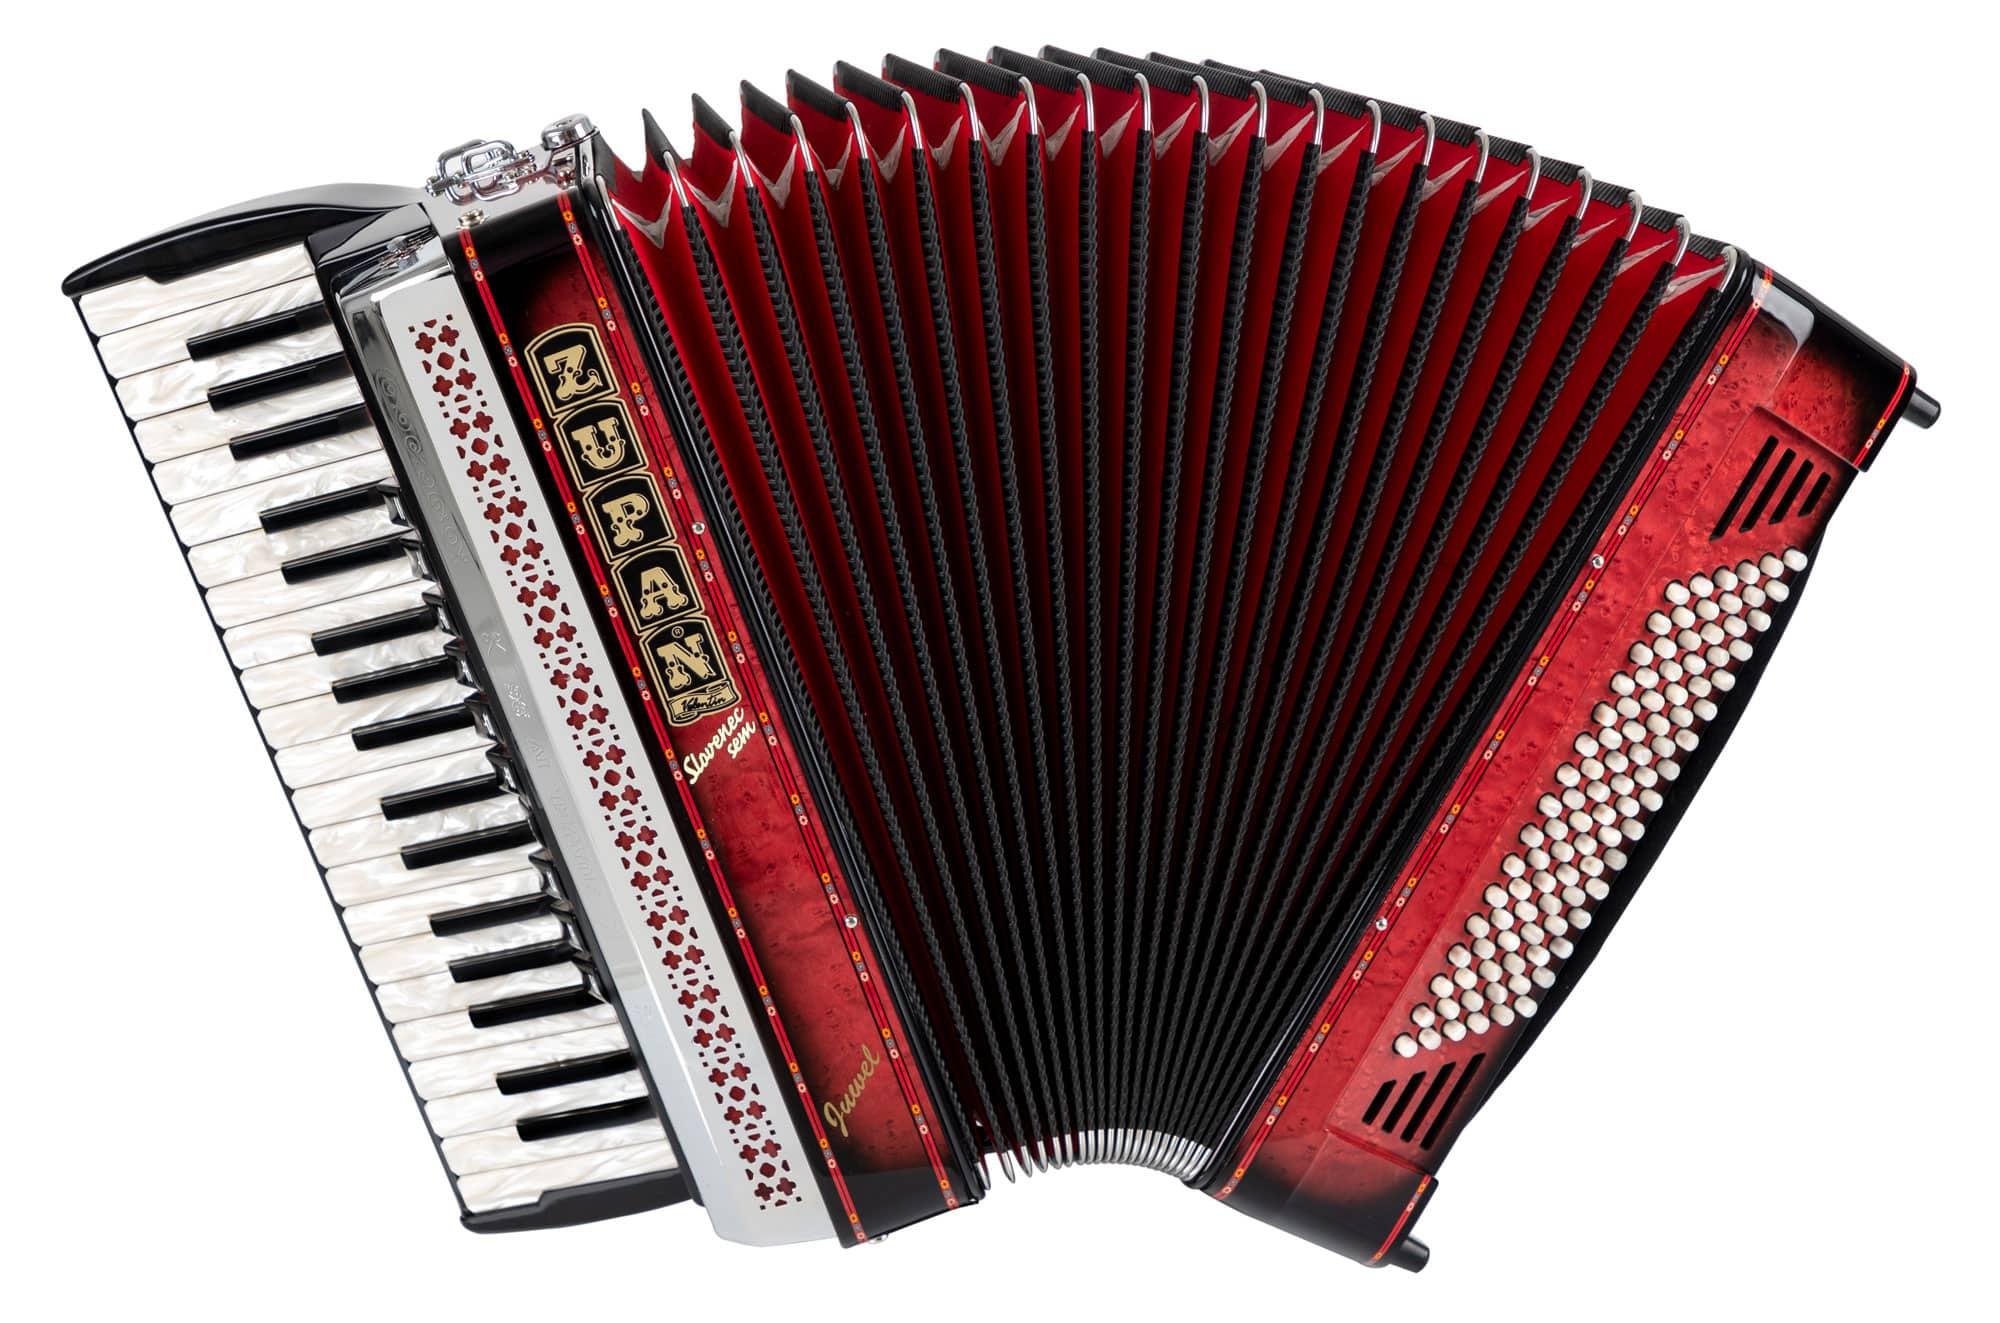 Akkordeons - Zupan Juwel IV 96 MH Akkordeon Shadow Red Retoure (Zustand wie neu) - Onlineshop Musikhaus Kirstein